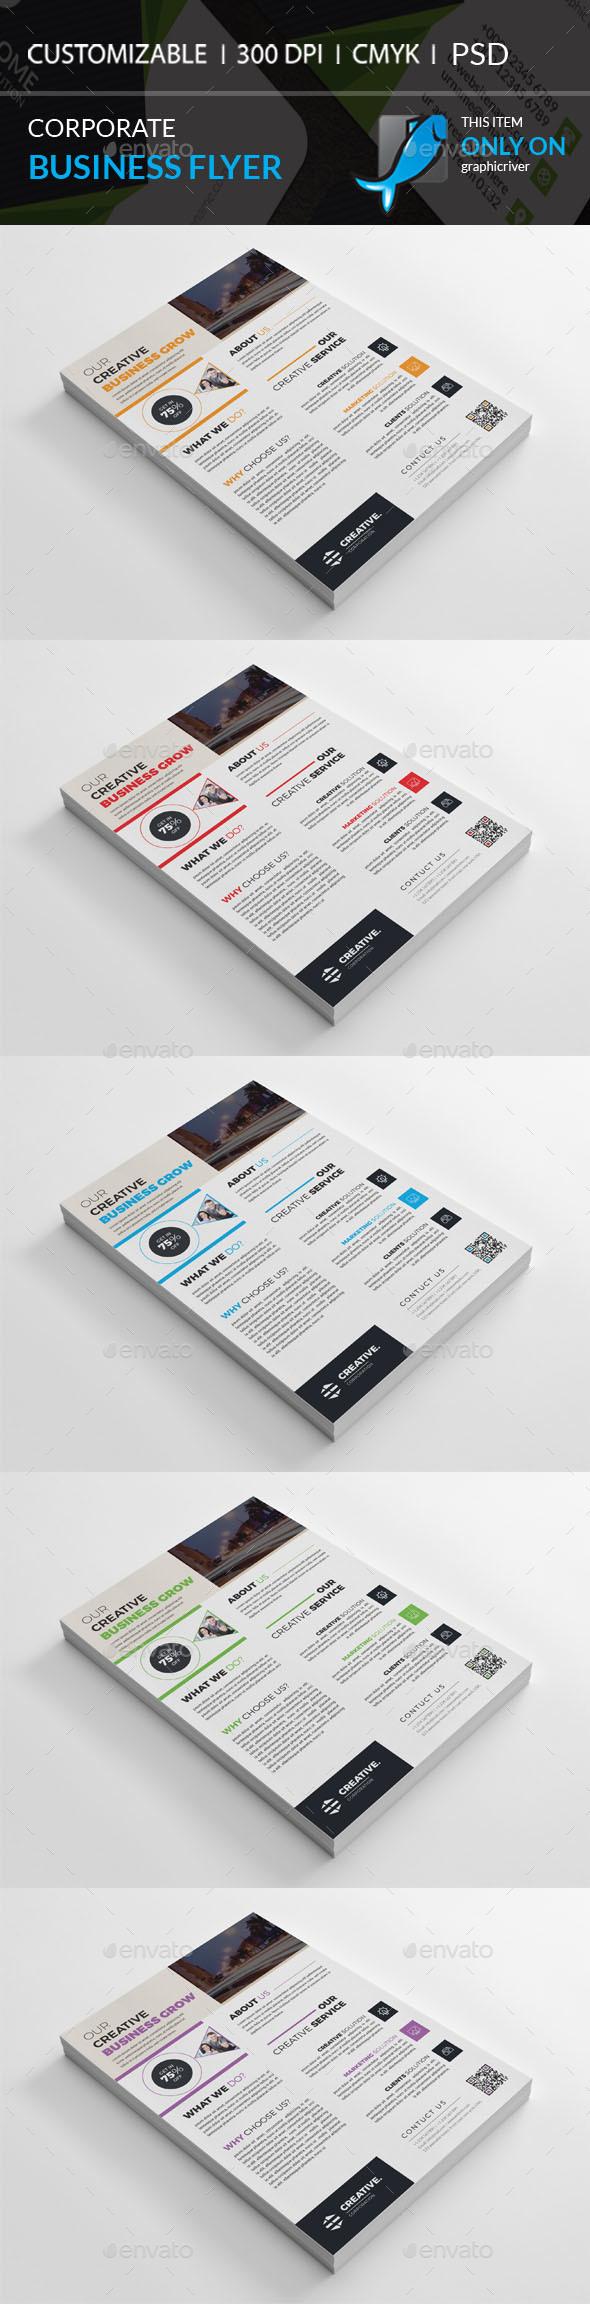 GraphicRiver Corporate Flyer 20815396